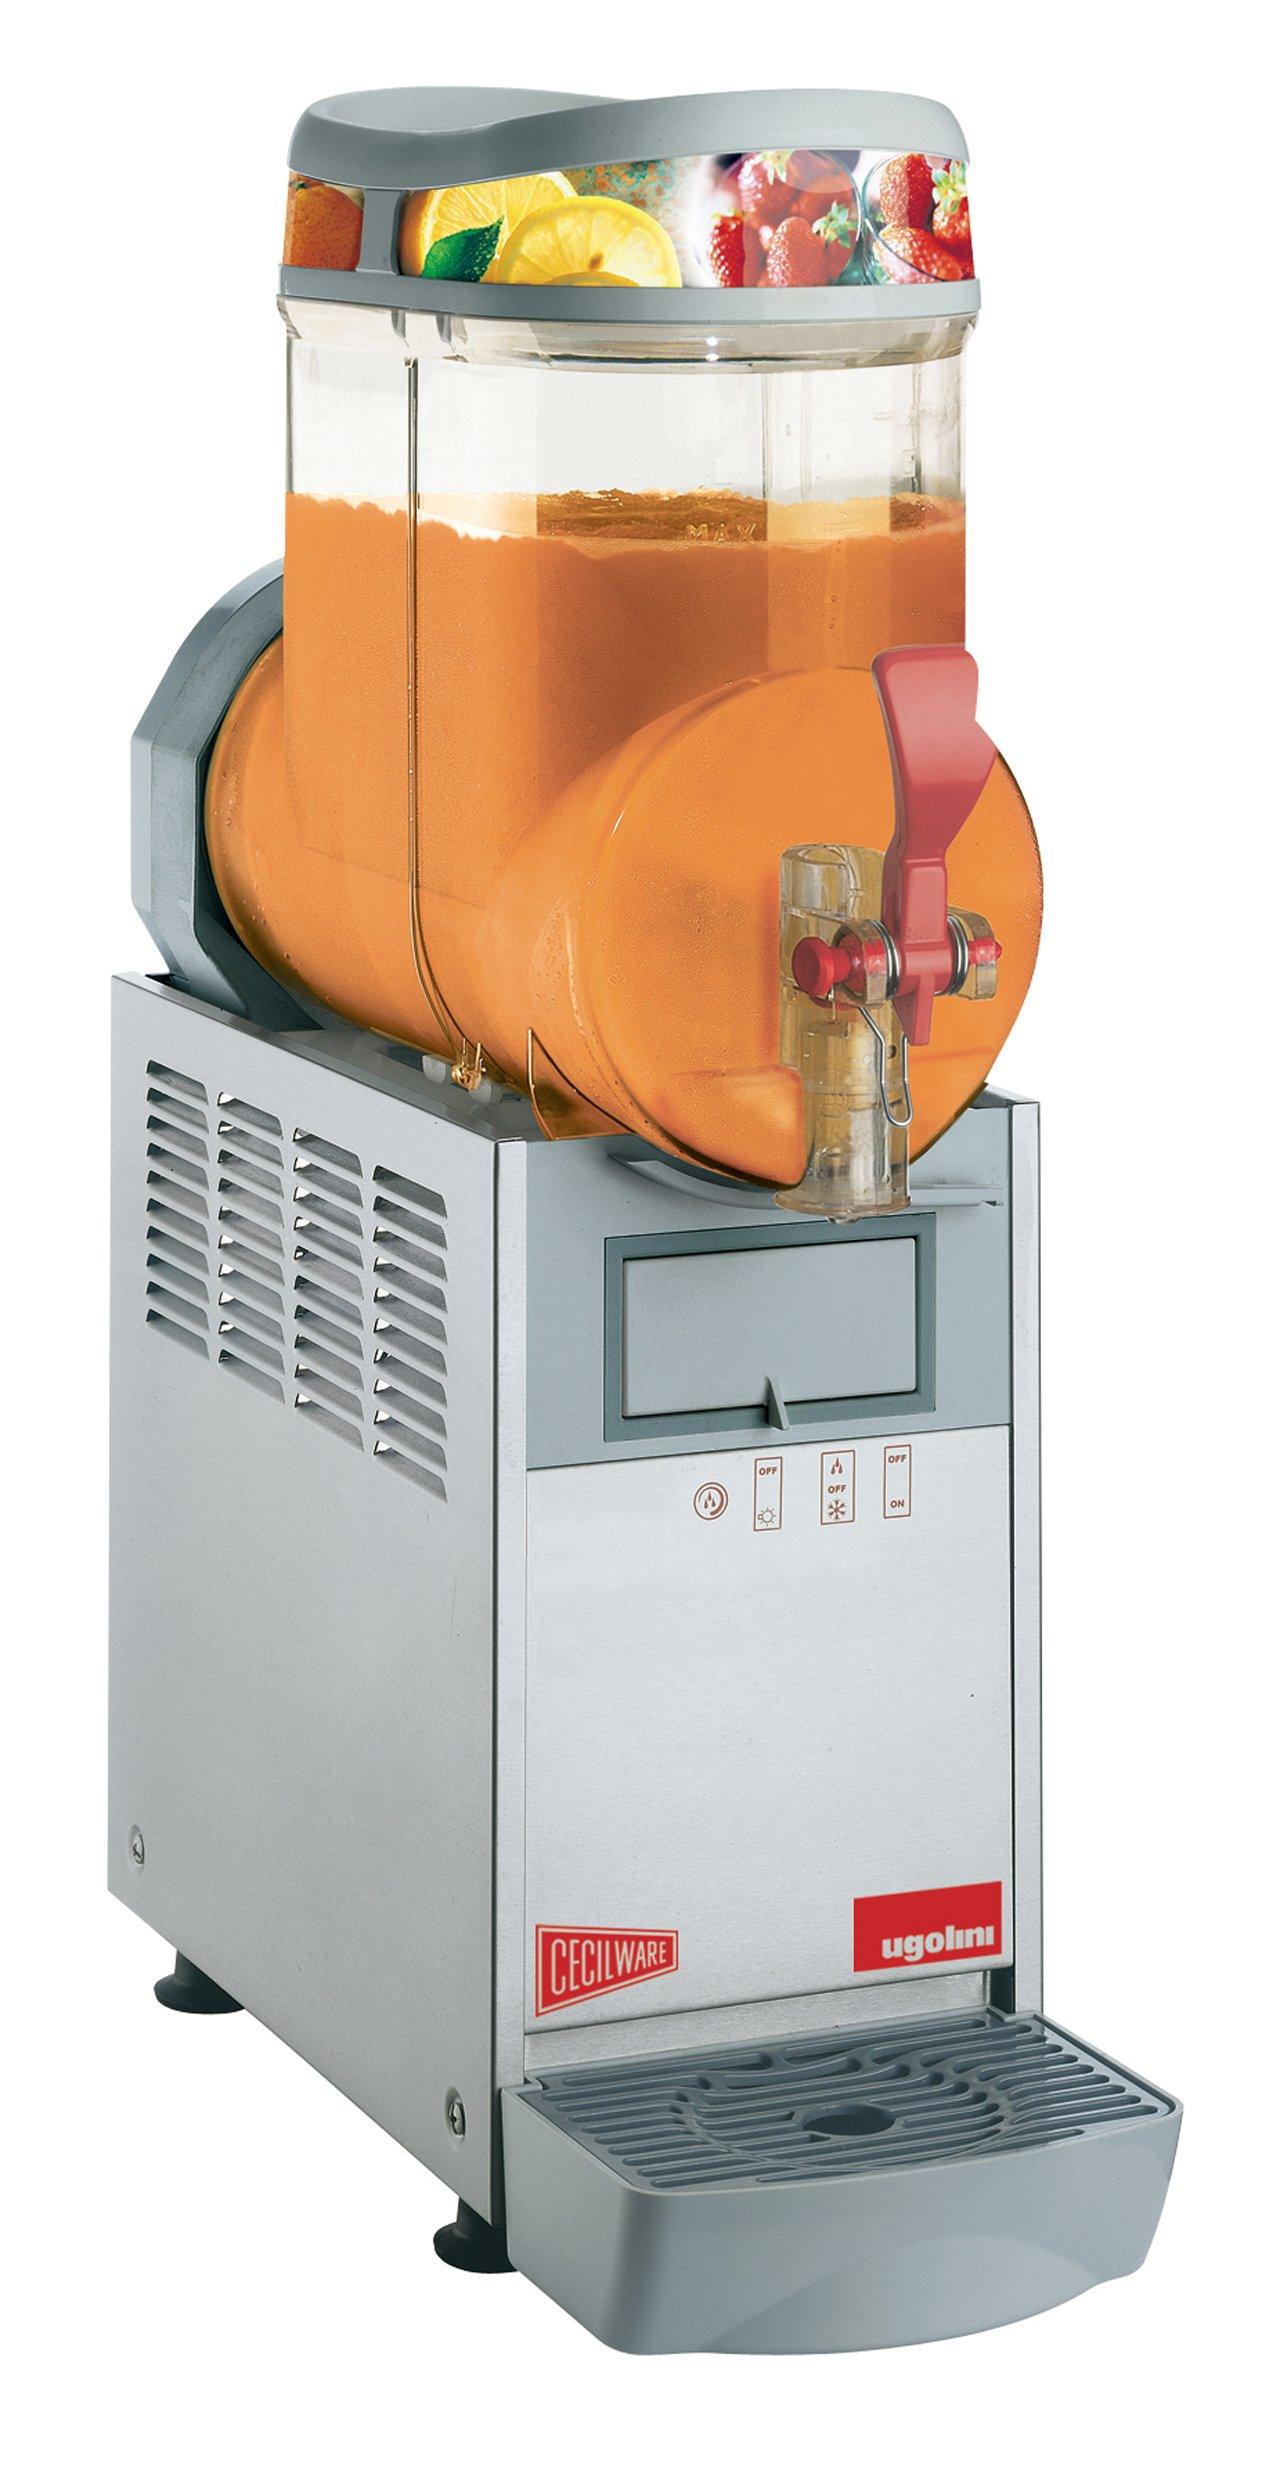 Grindmaster-Cecilware MT1Mini Stainless Steel FrigoGranita 1.5-Gallon Slush Dispenser with Magnetic Drive, Single